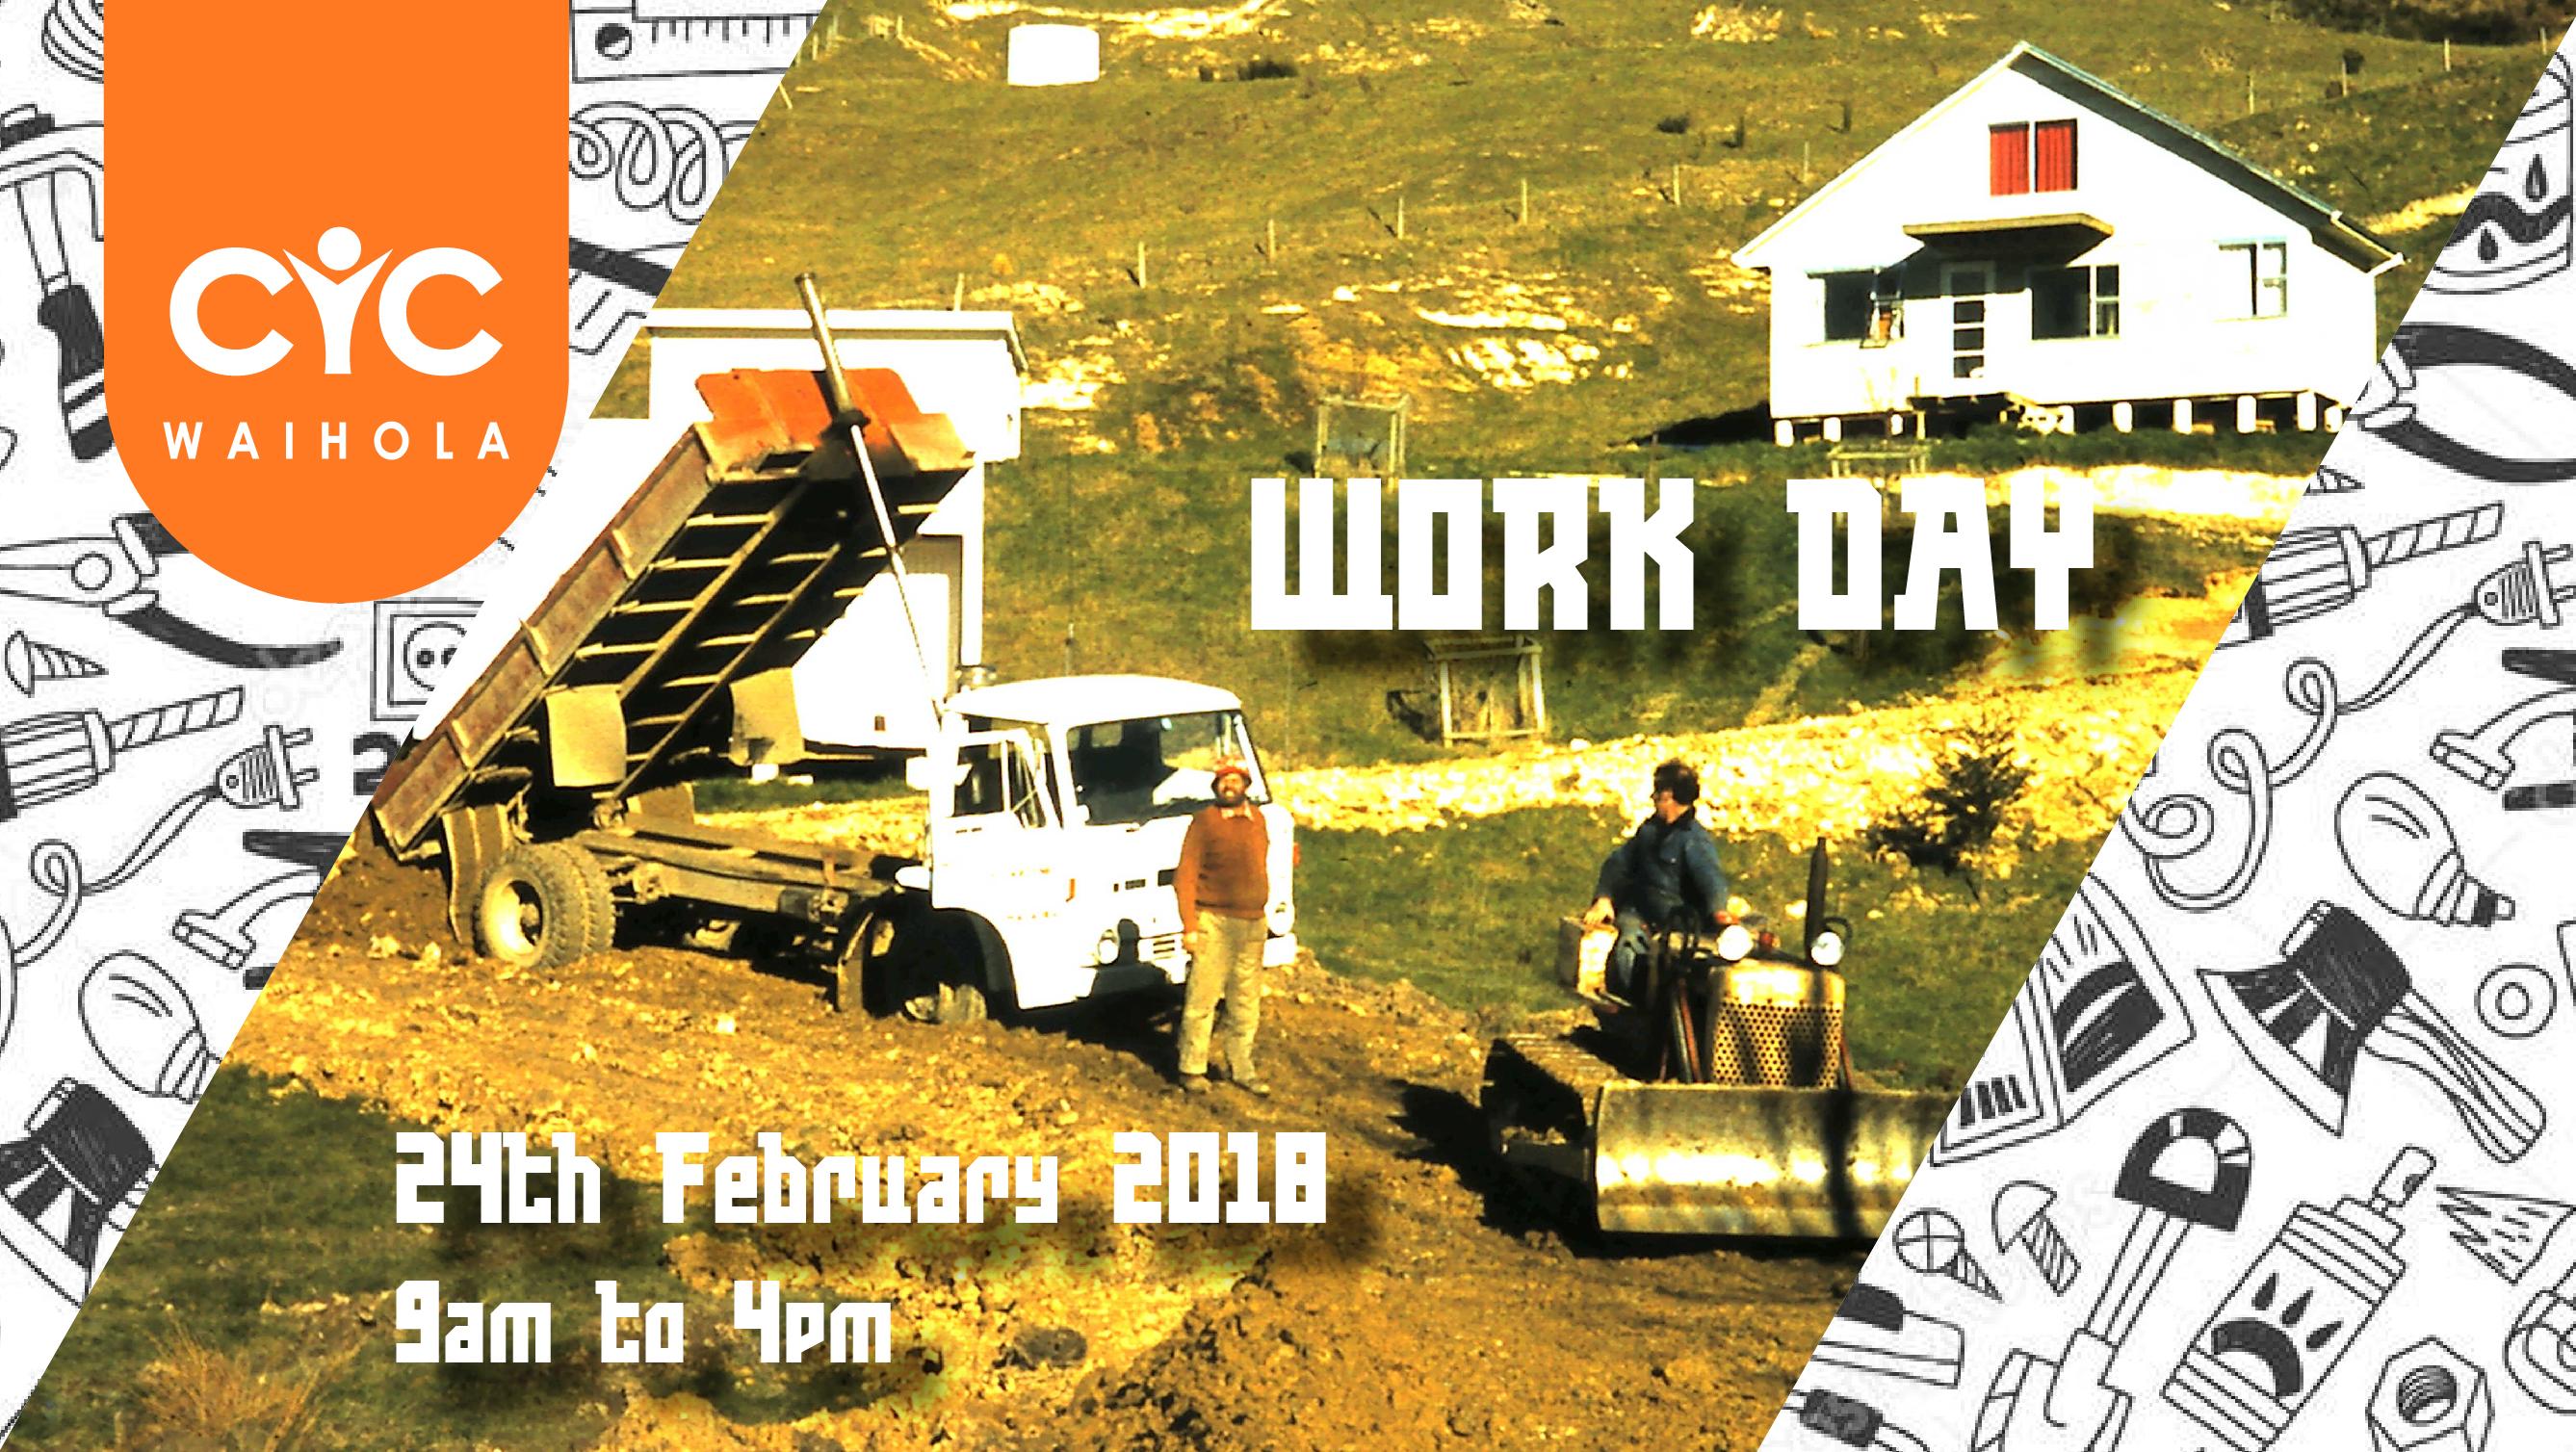 Work Day 24th February 2018